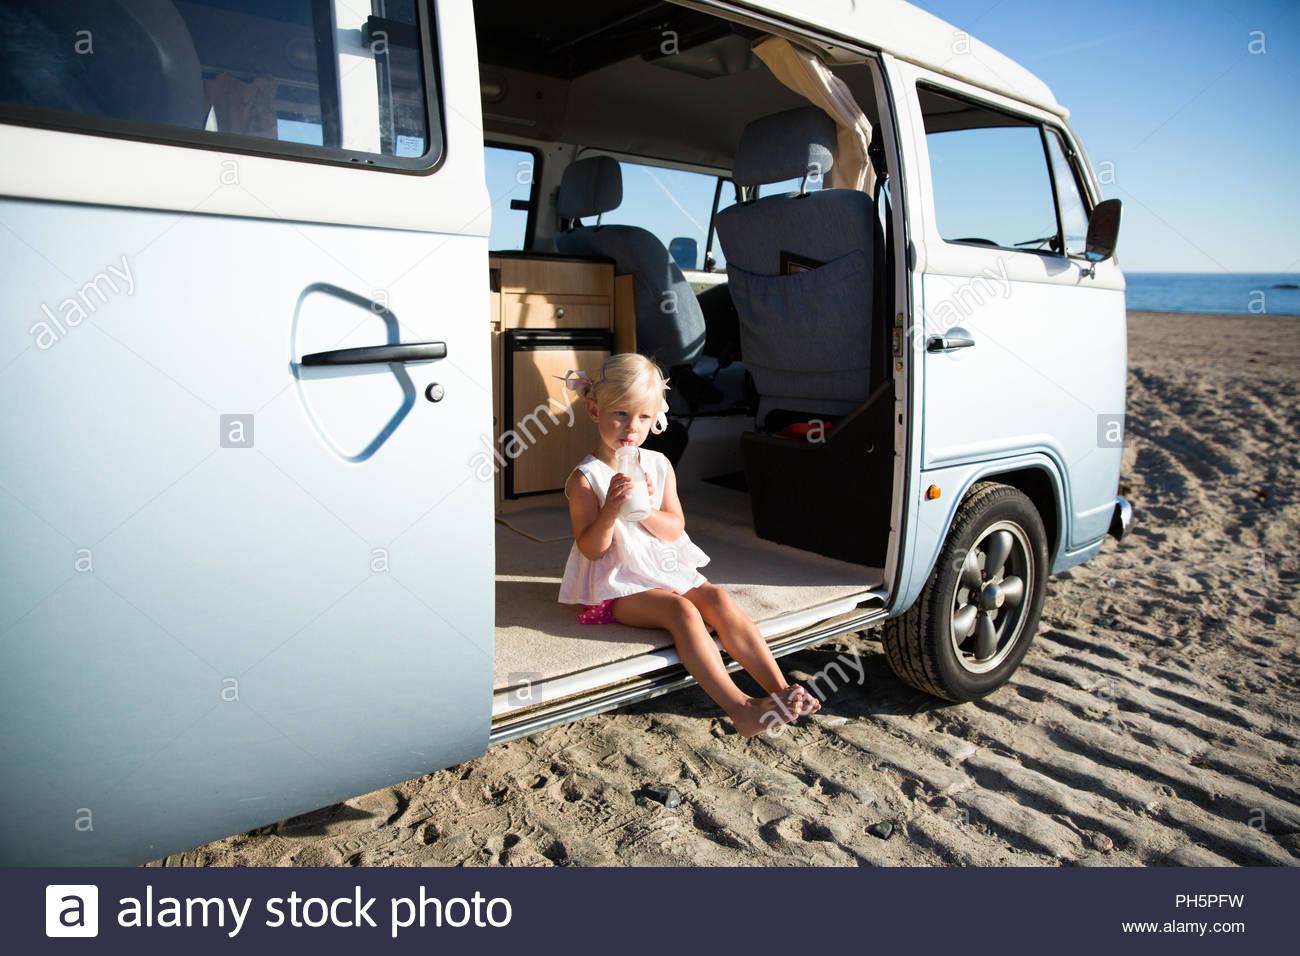 Girl drinking milk in van at beach - Stock Image